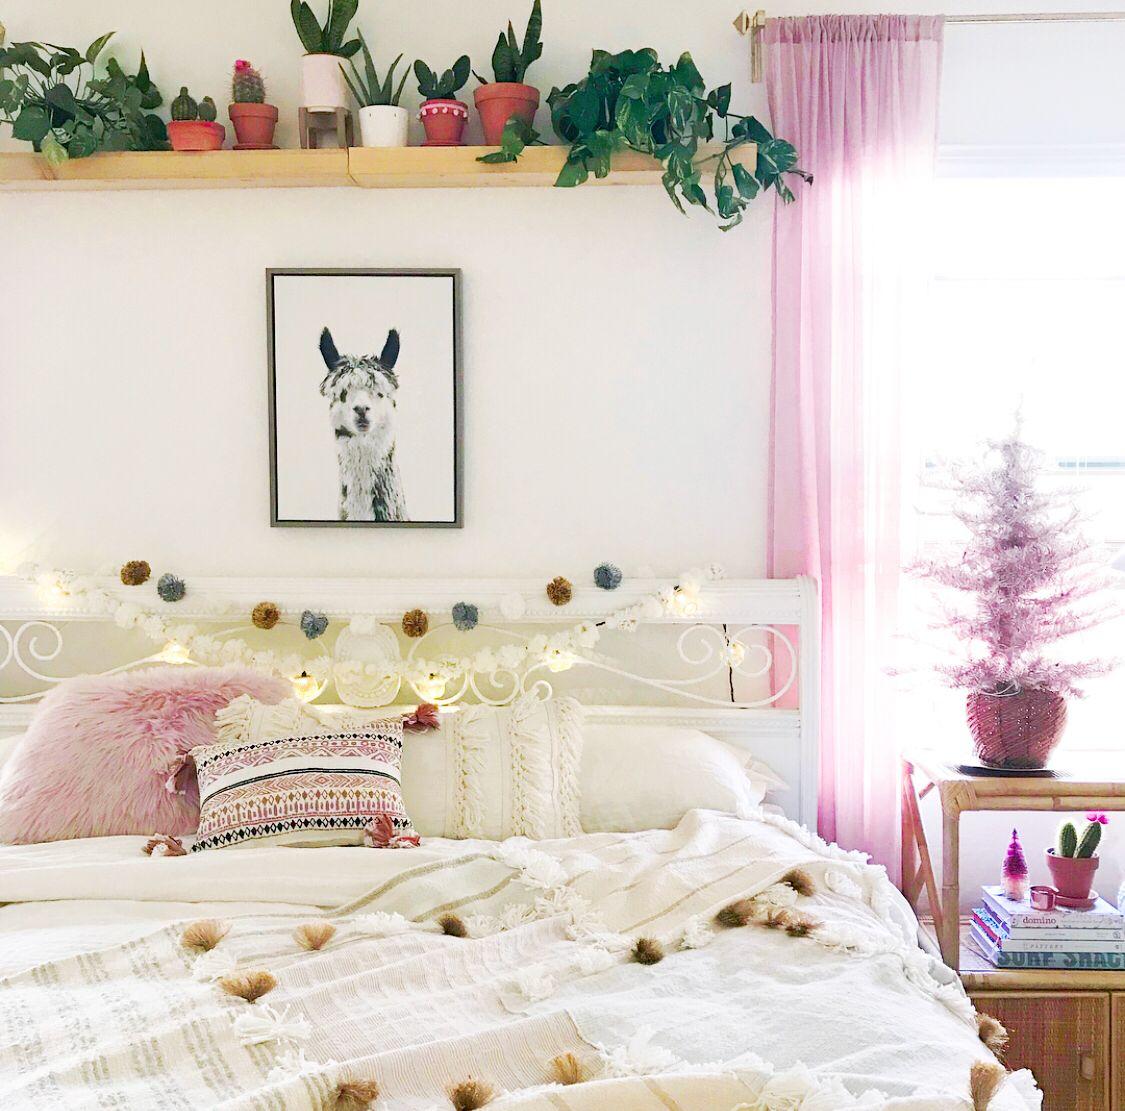 Master bedroom suite decor  Christmas decor bedroom  Master bedroom  Pinterest  Bedrooms and